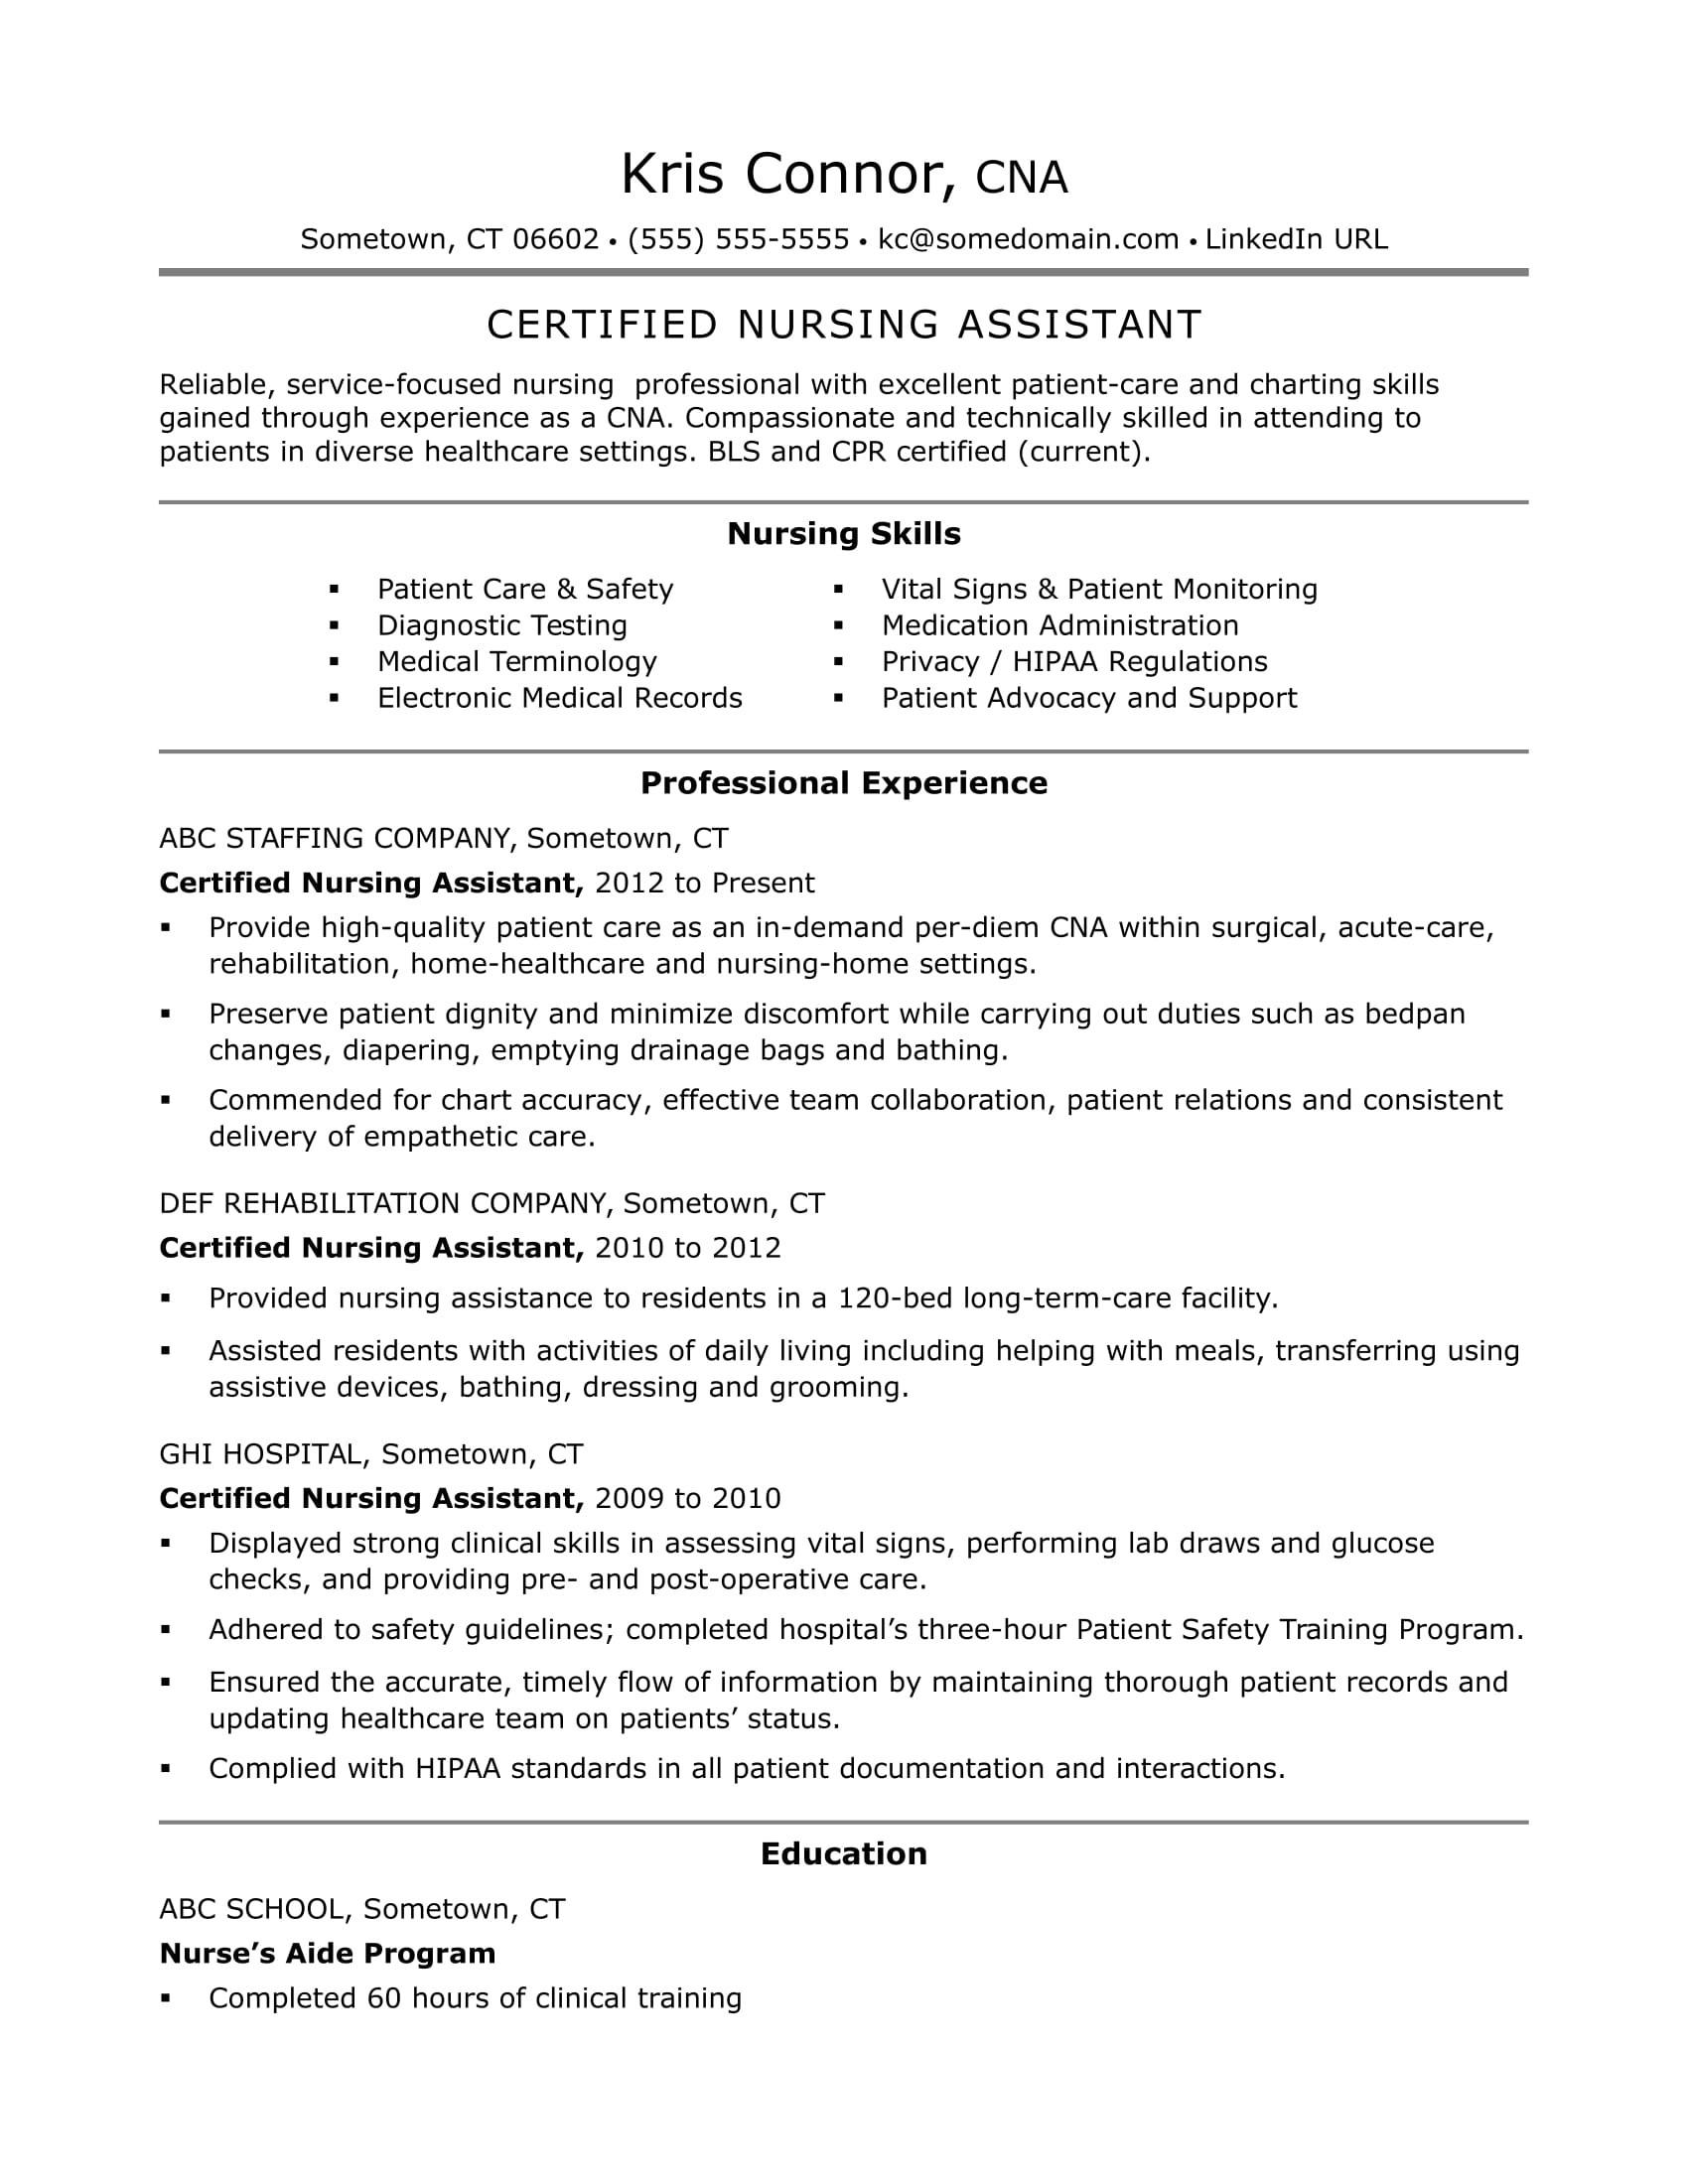 sample resume certified nursing assistant